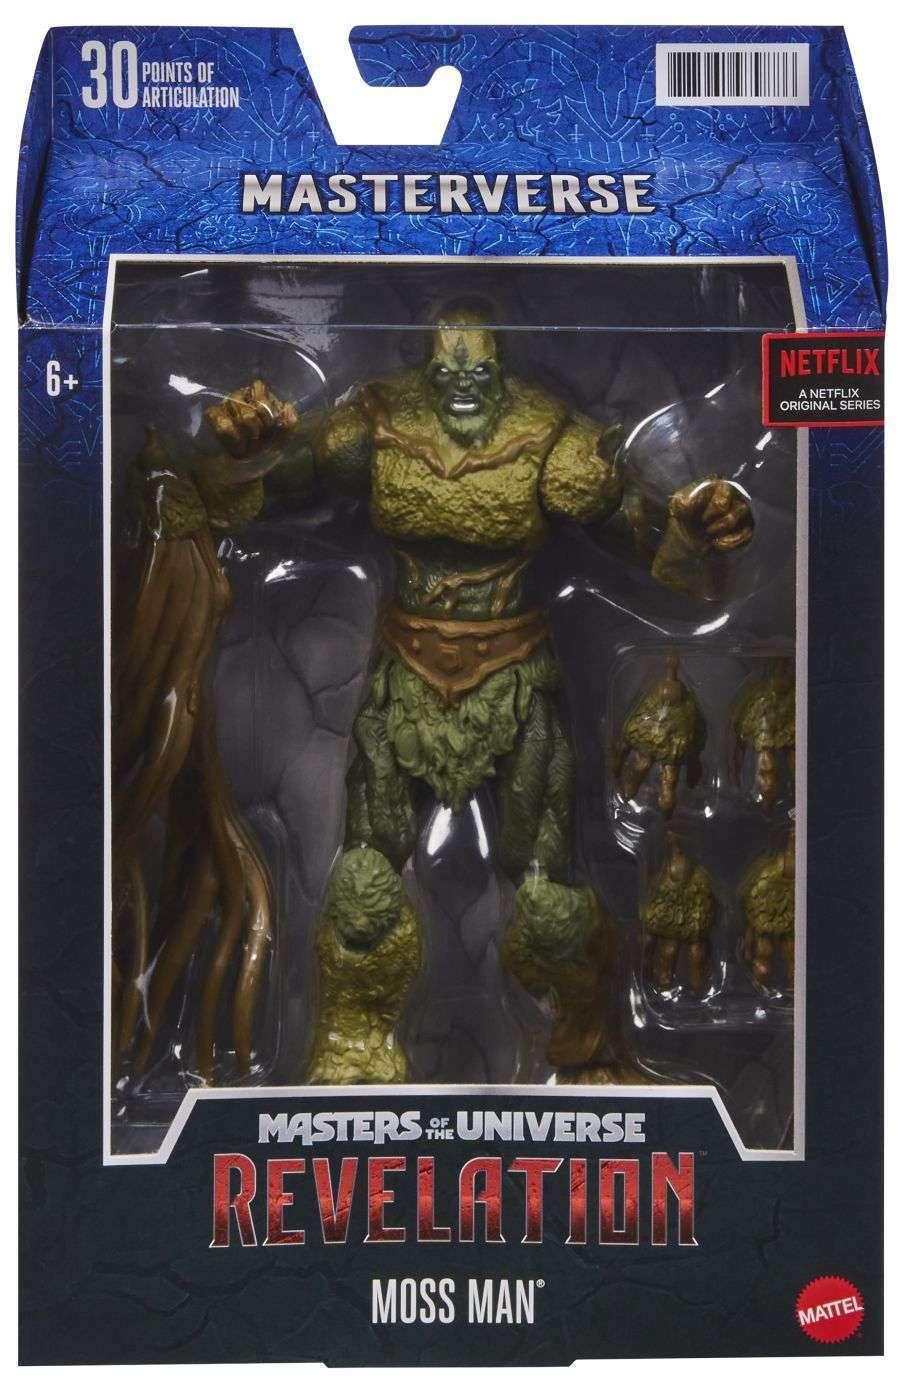 Masterverse Moss Man GYV11_03